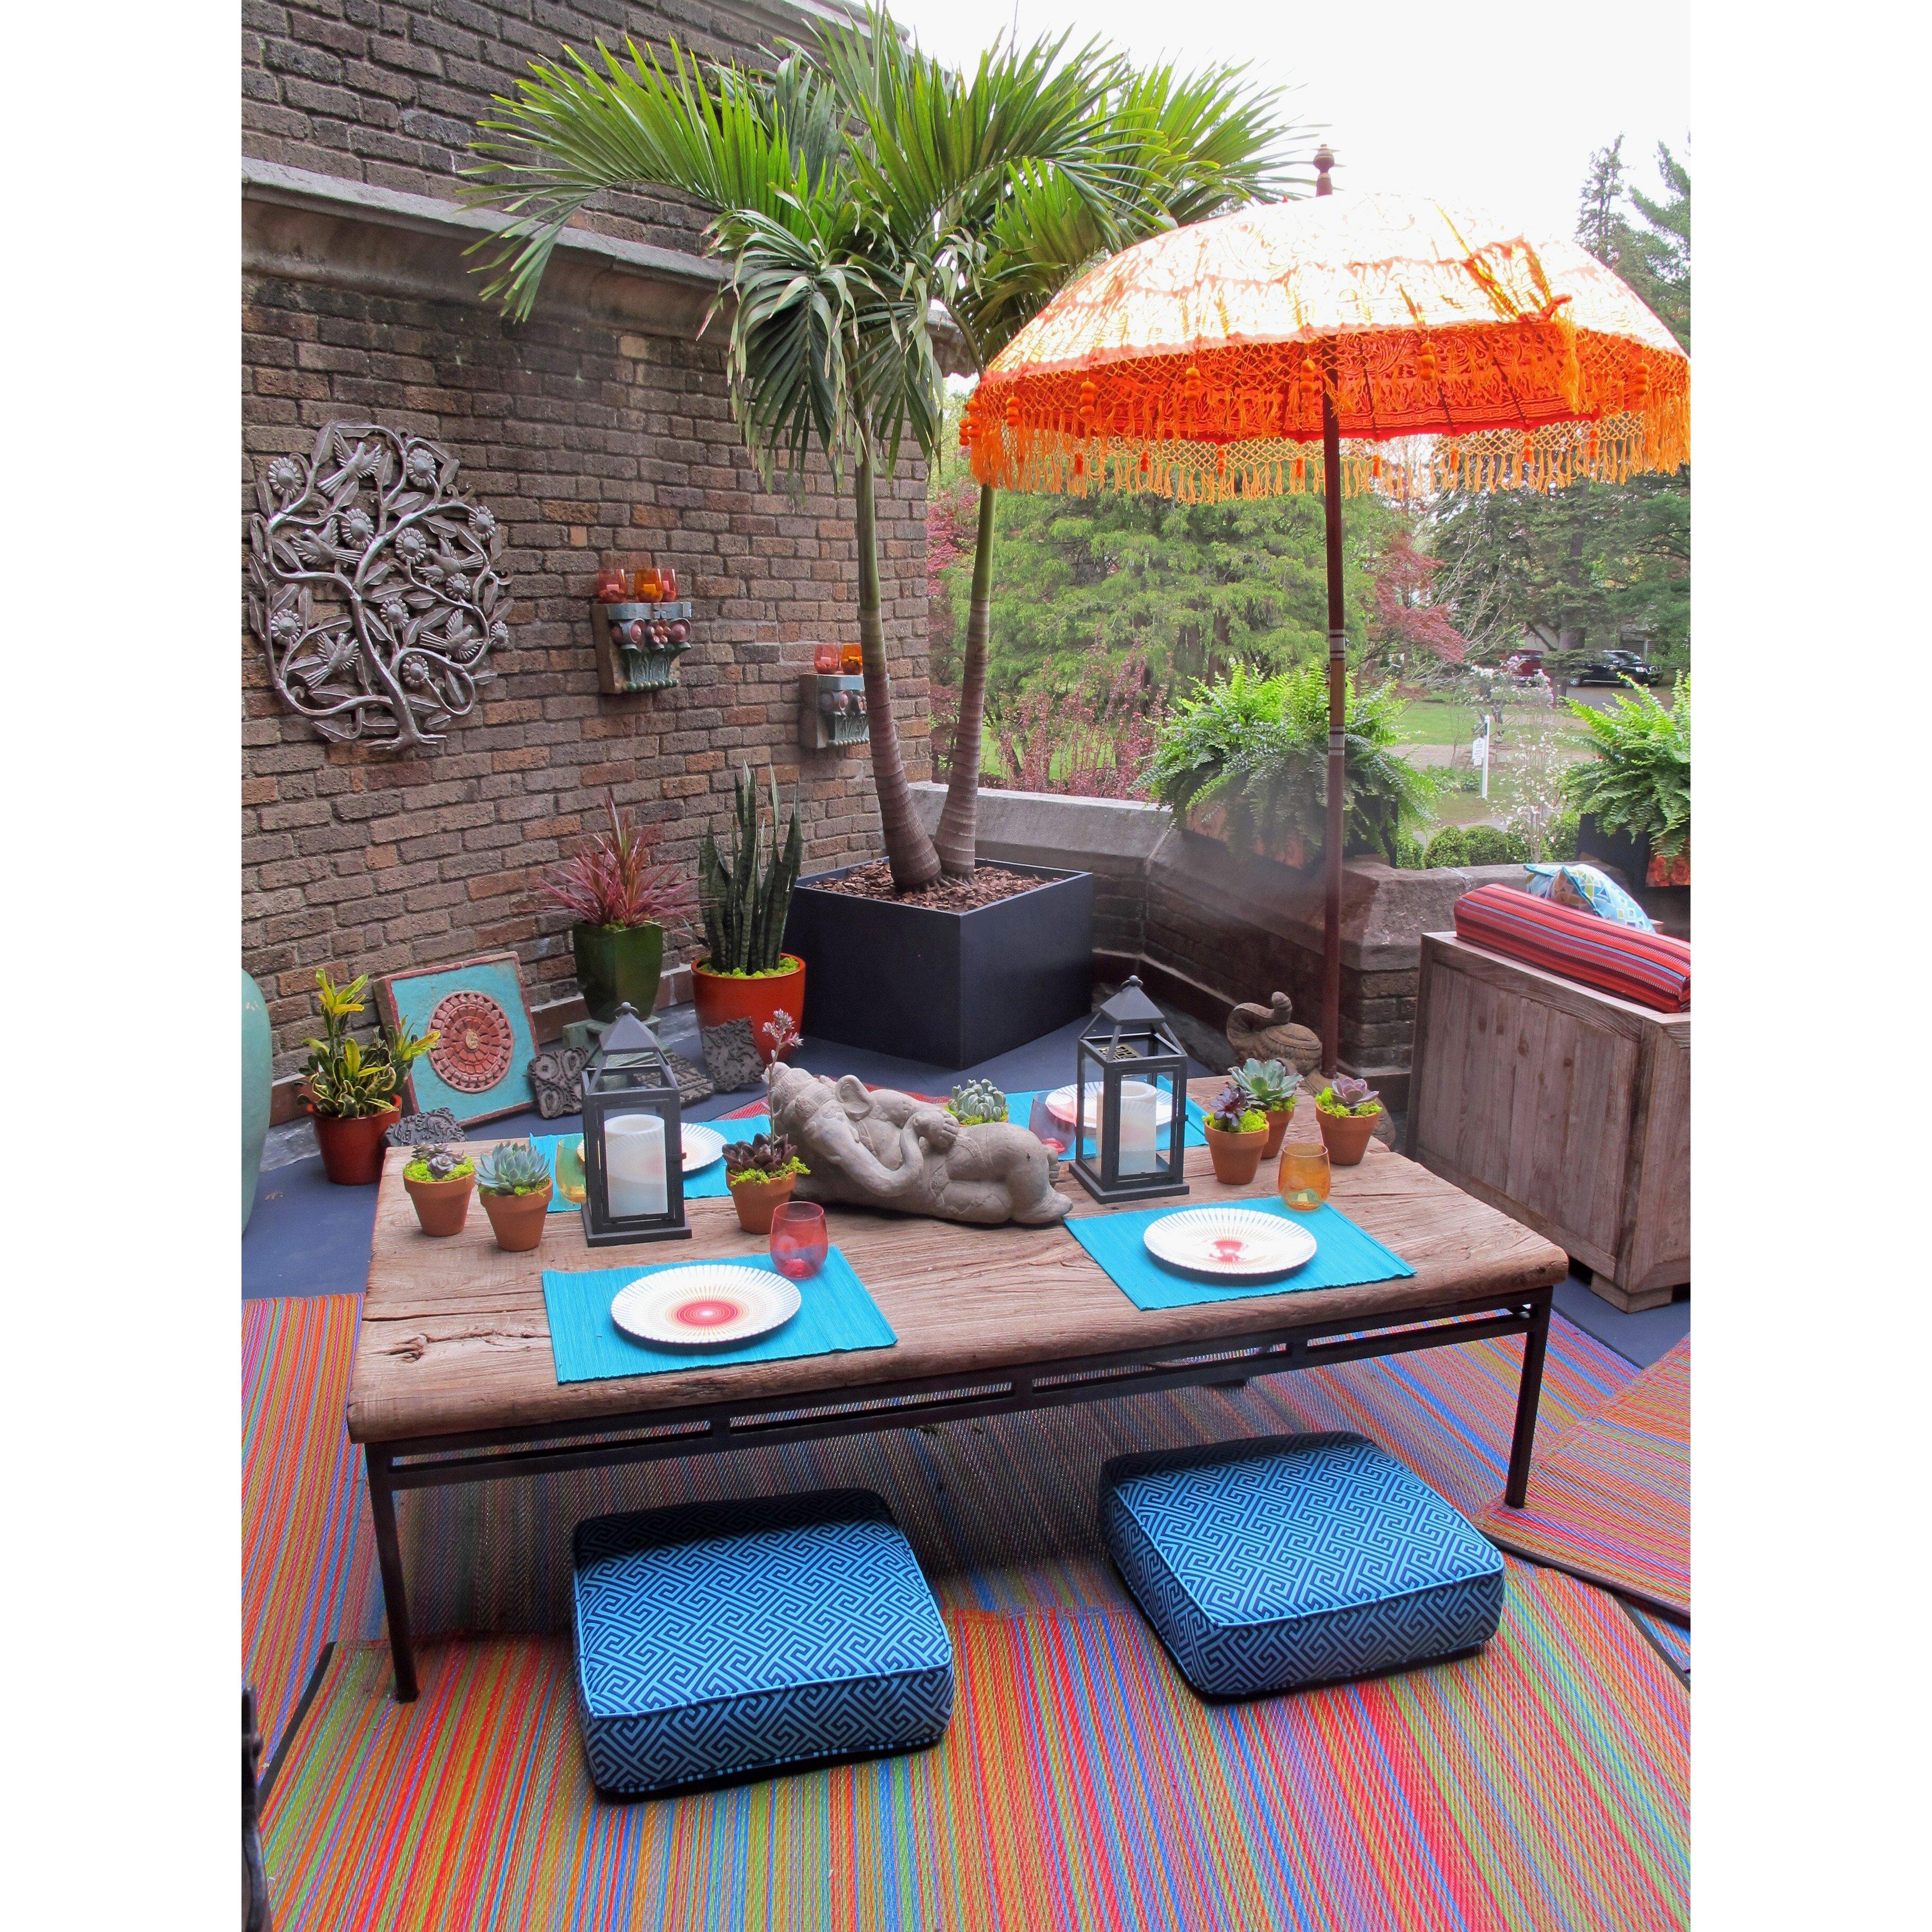 World Cancun Indoor Outdoor Area Rug